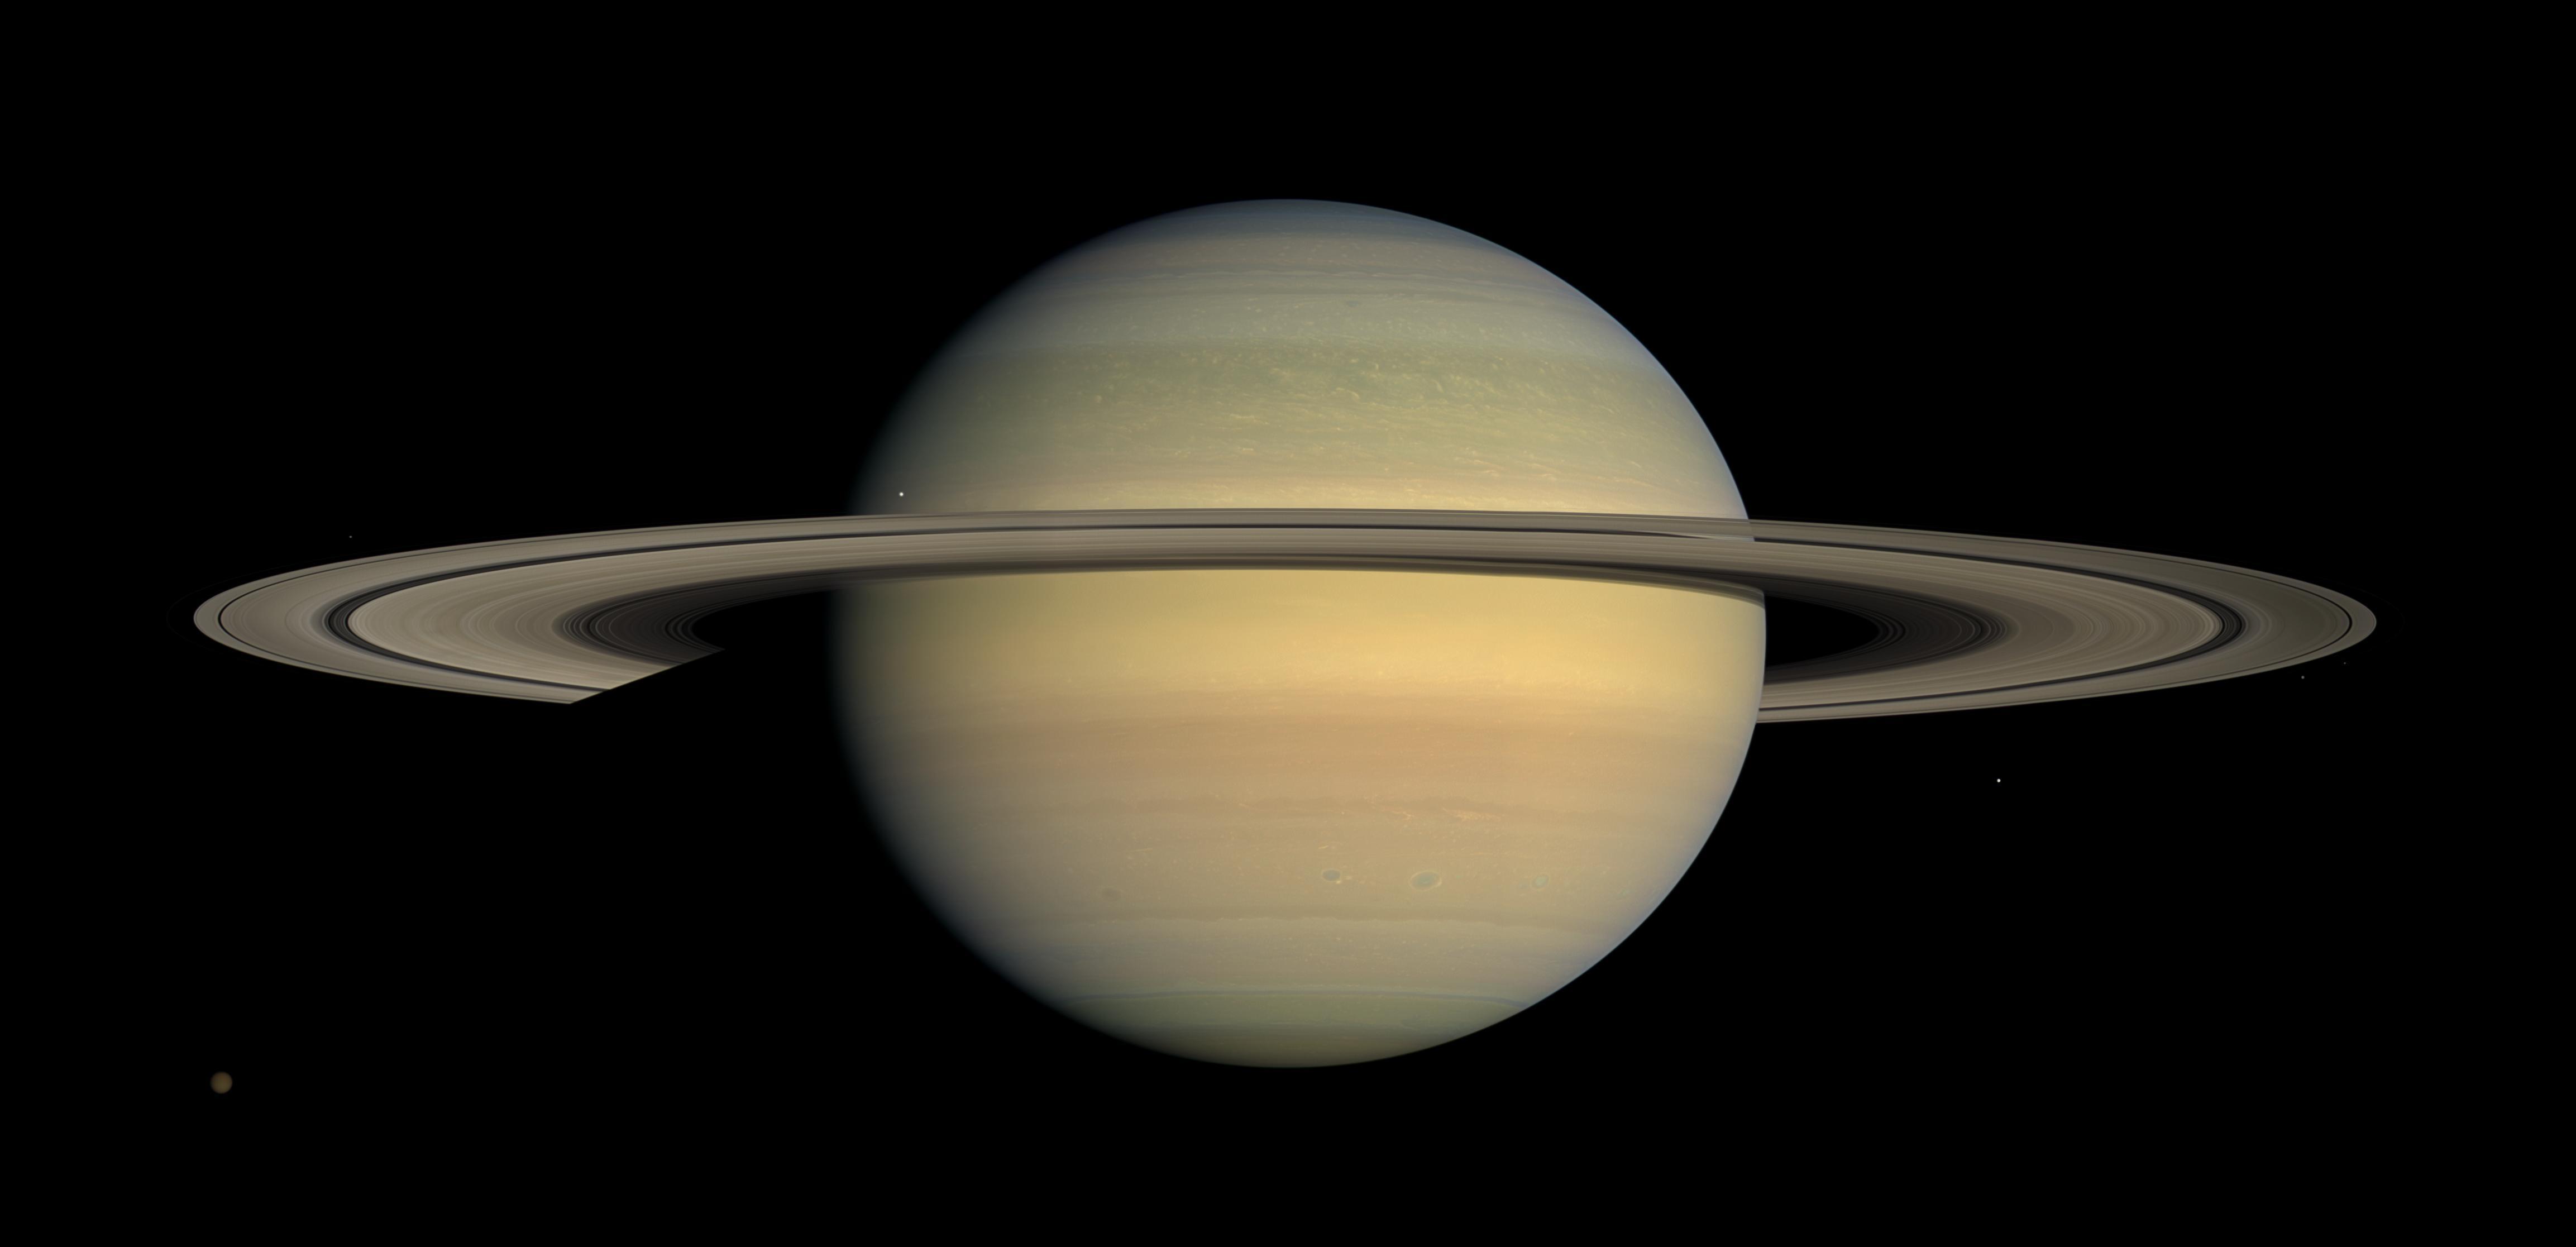 Solar System Exploration